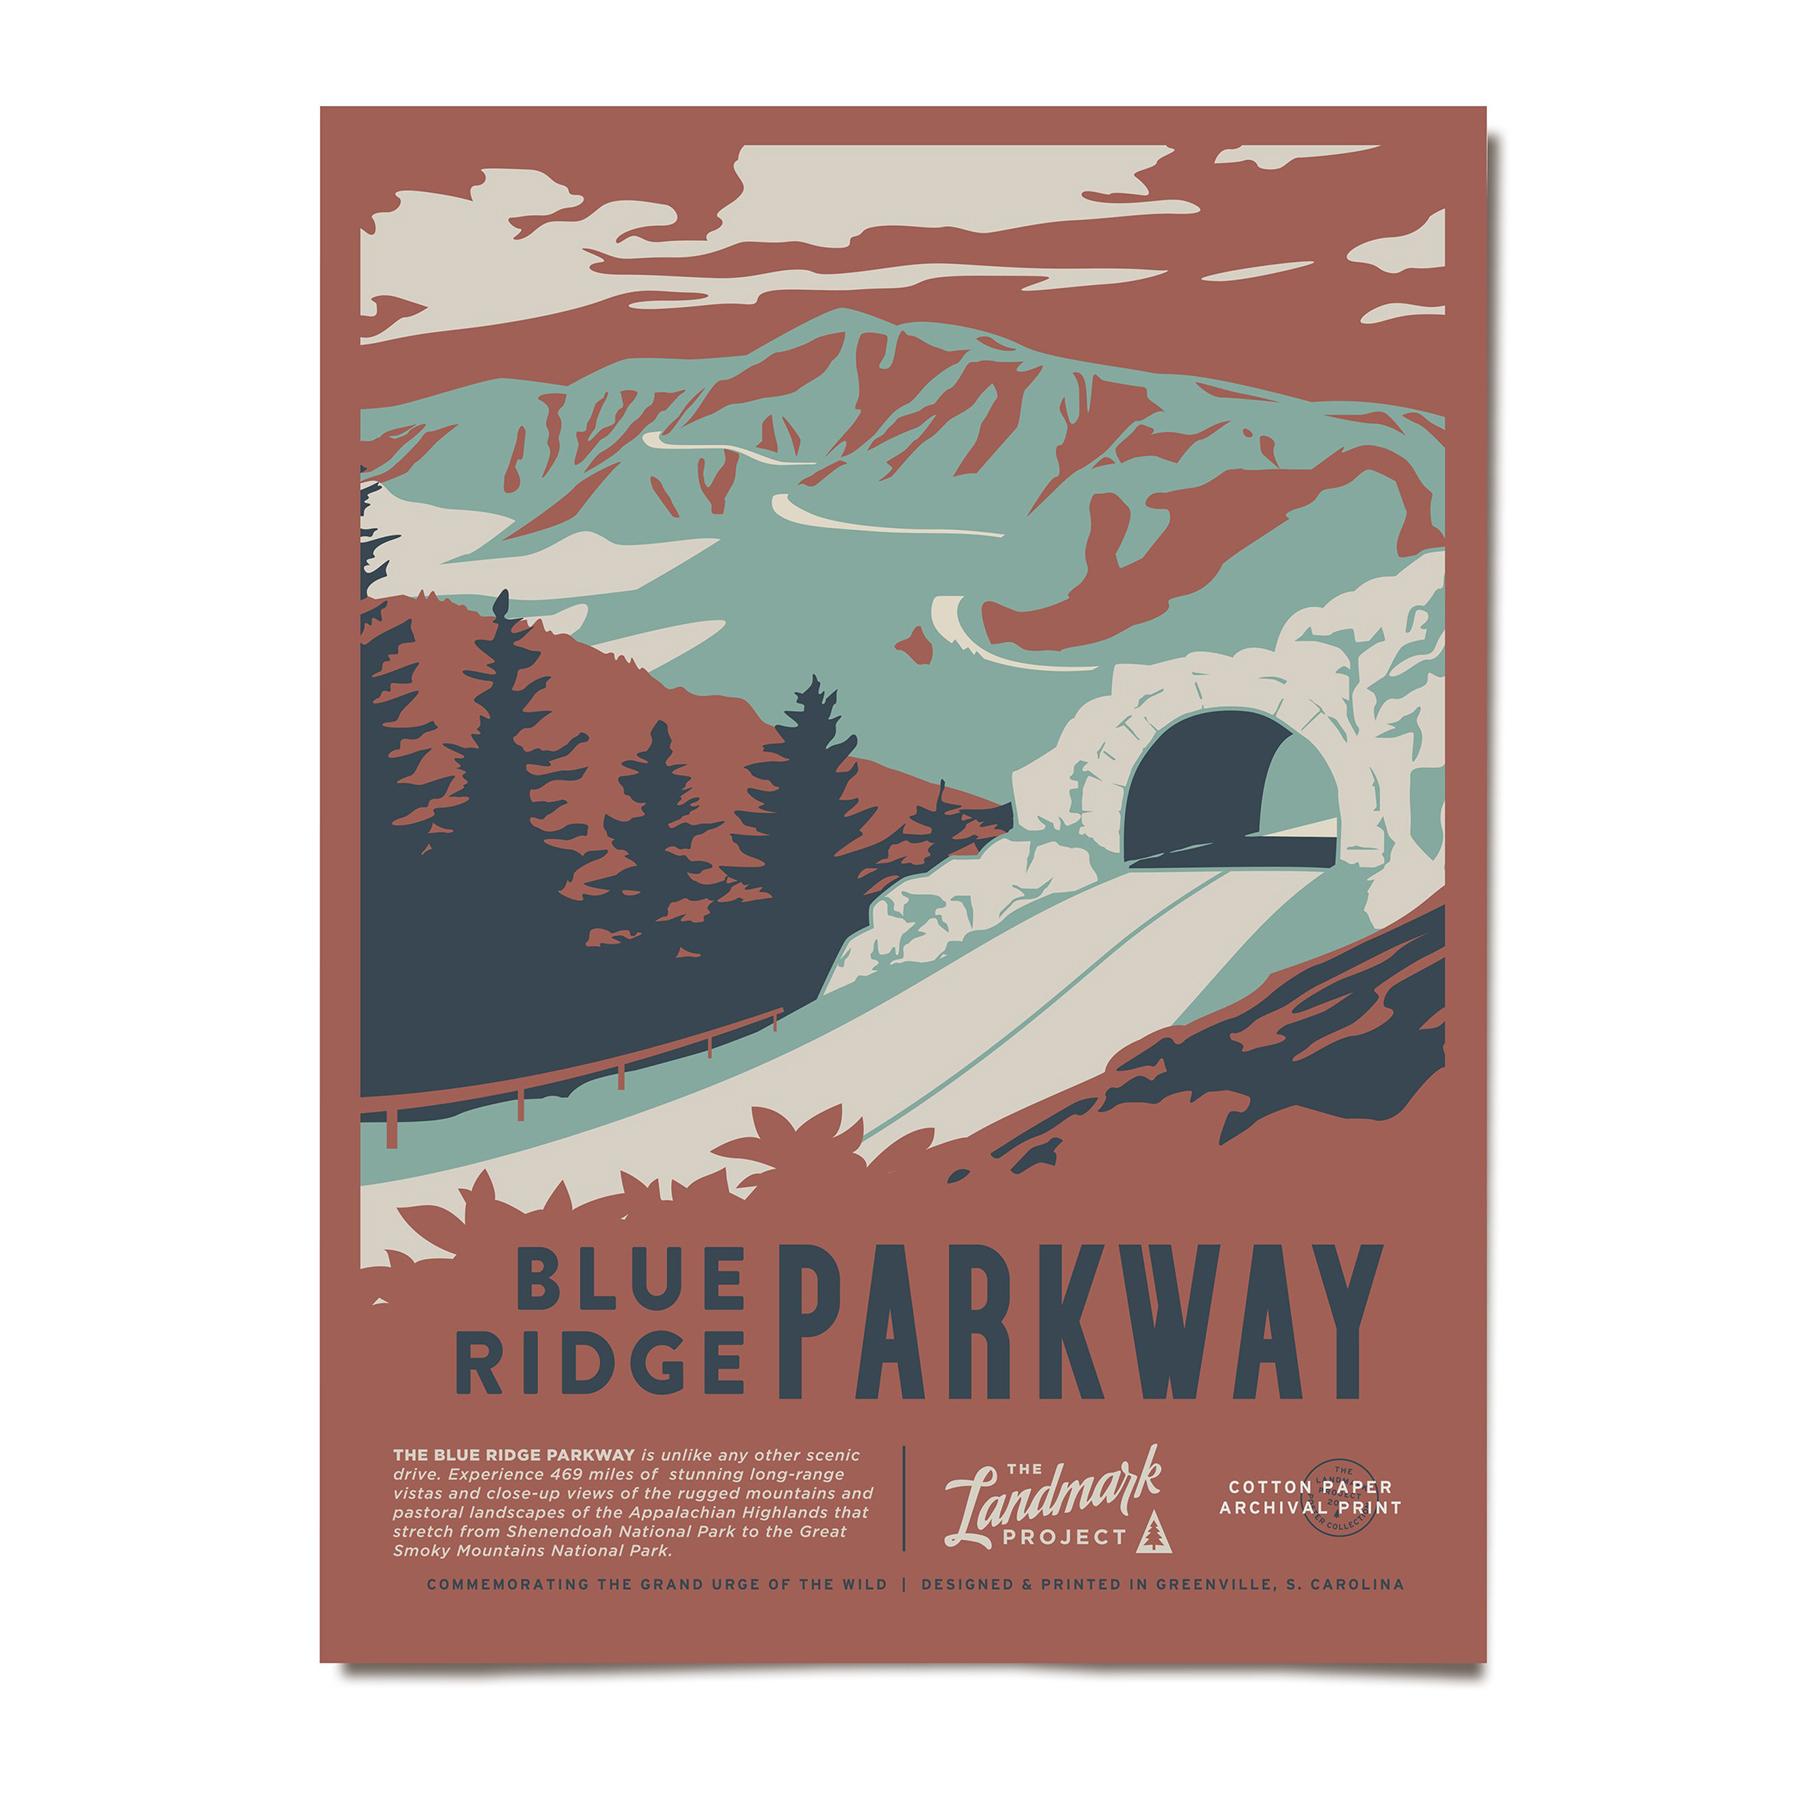 blueridge-parkway-poster.jpg